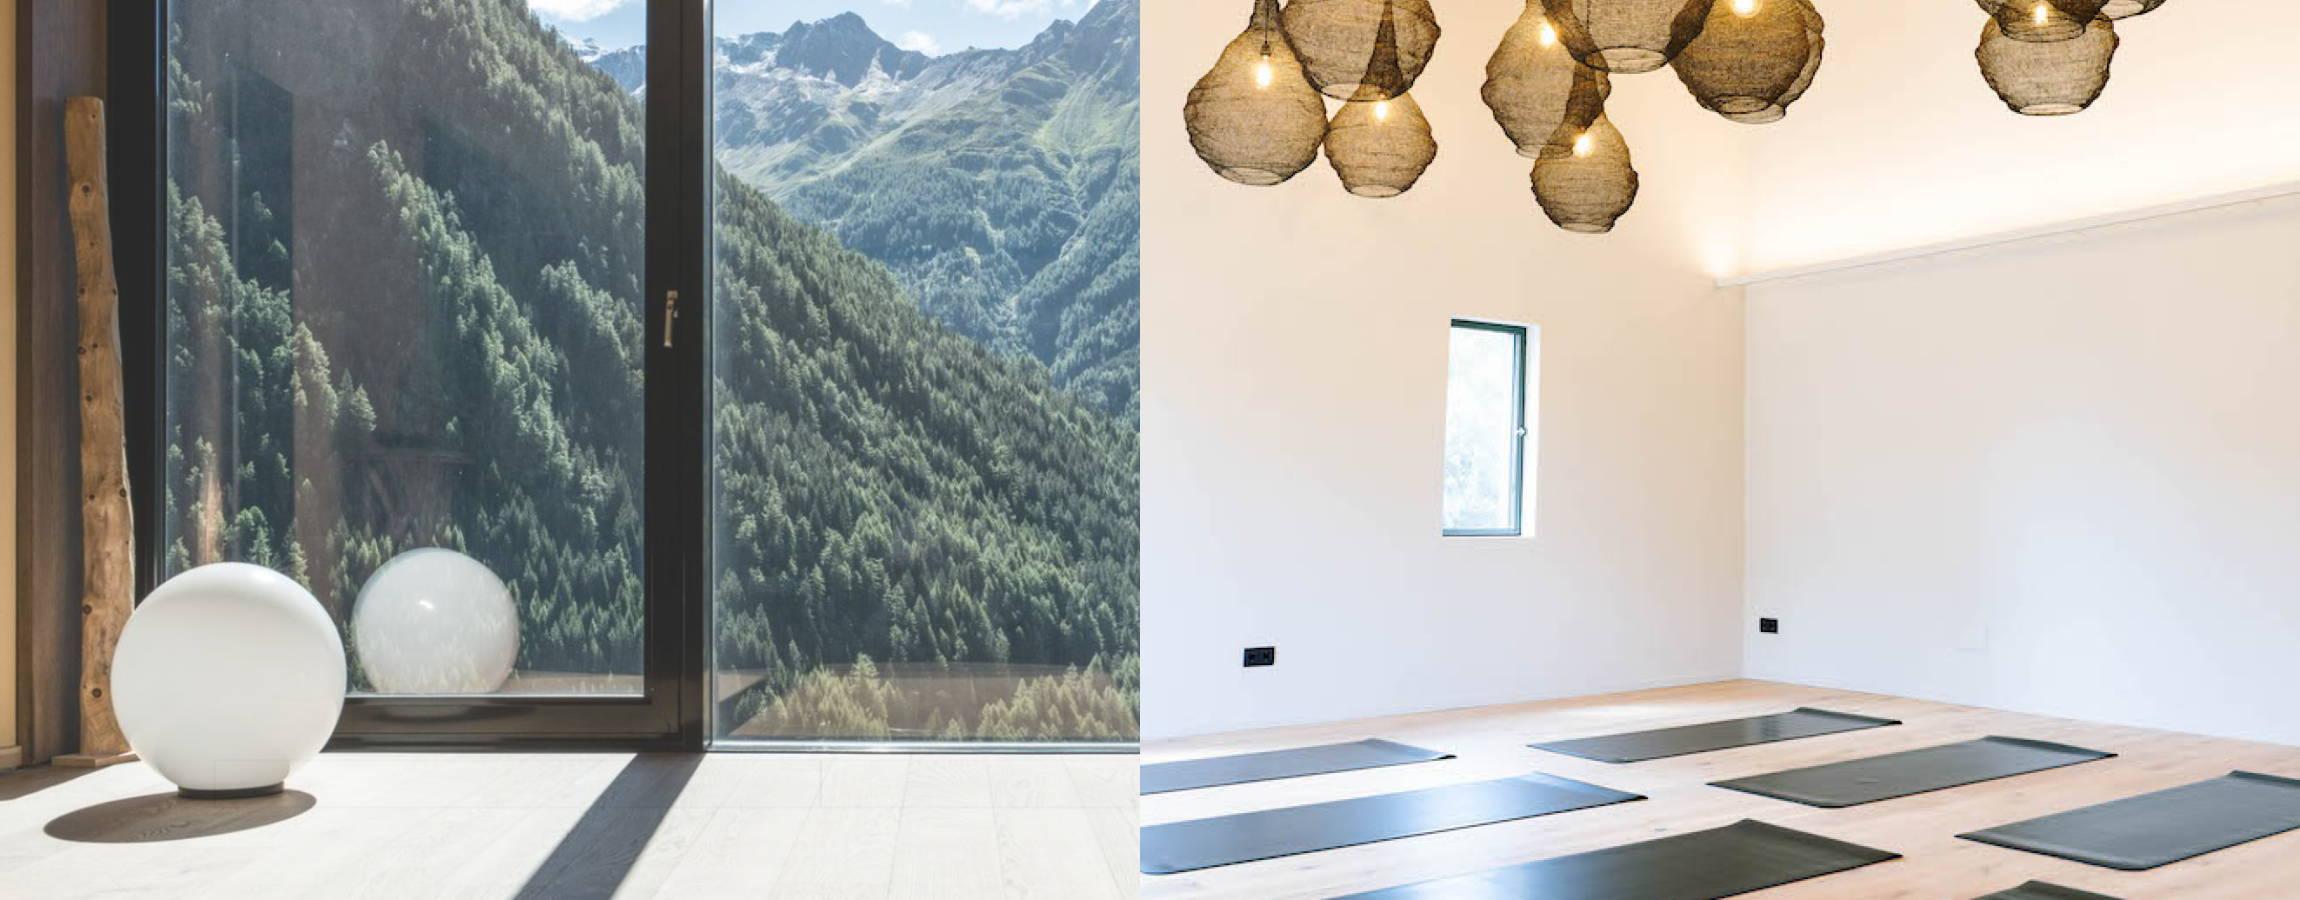 Yoga Mountain Retreat in Switzerland